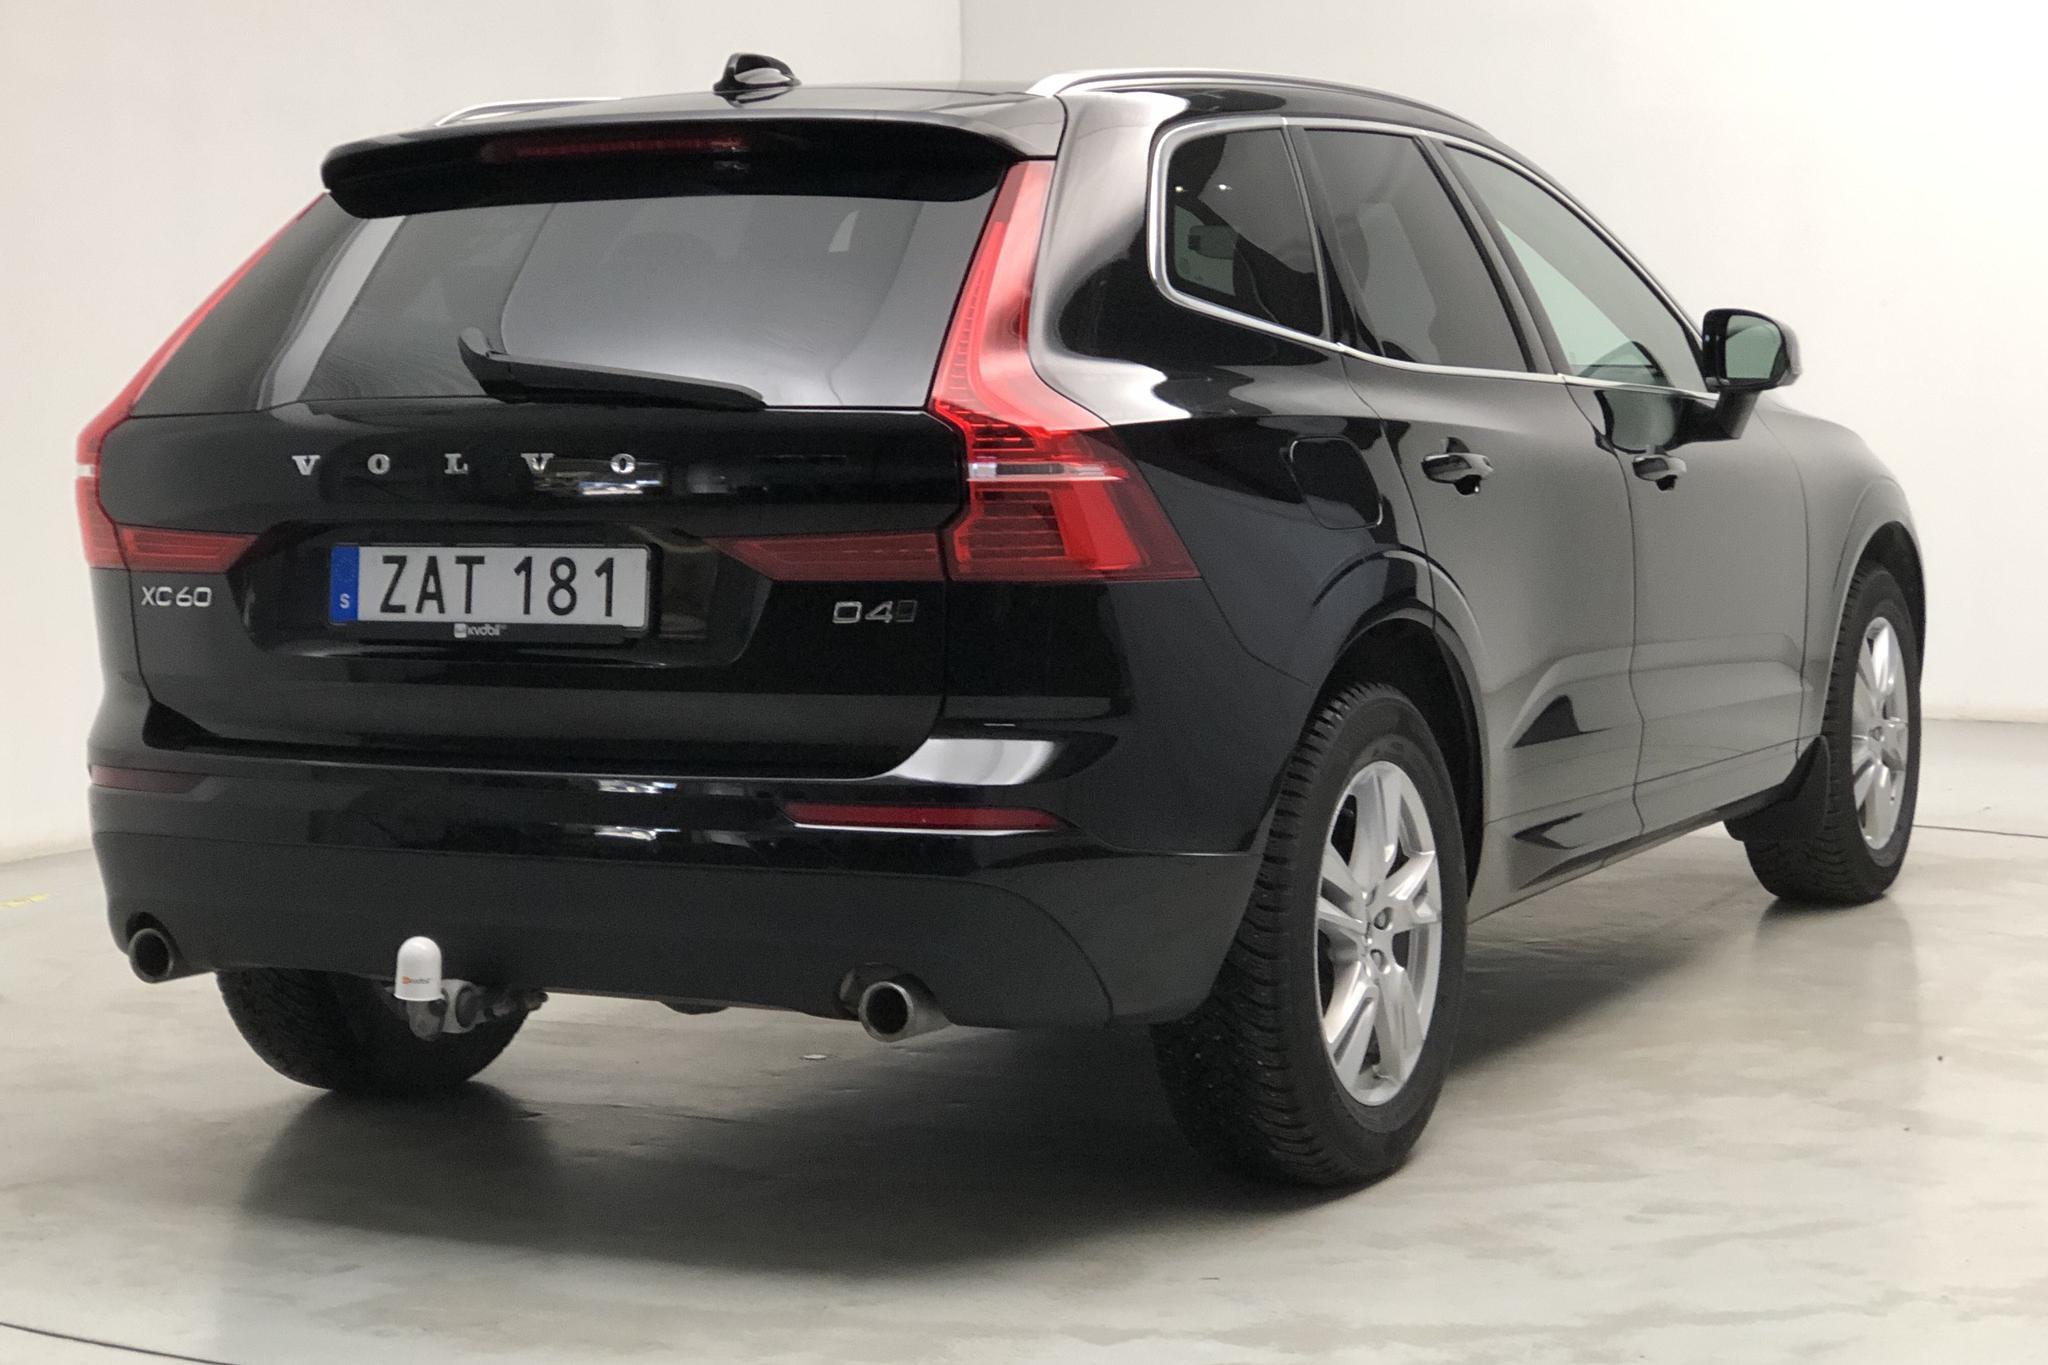 Volvo XC60 D4 AWD (190hk) - 133 030 km - Automatic - black - 2018